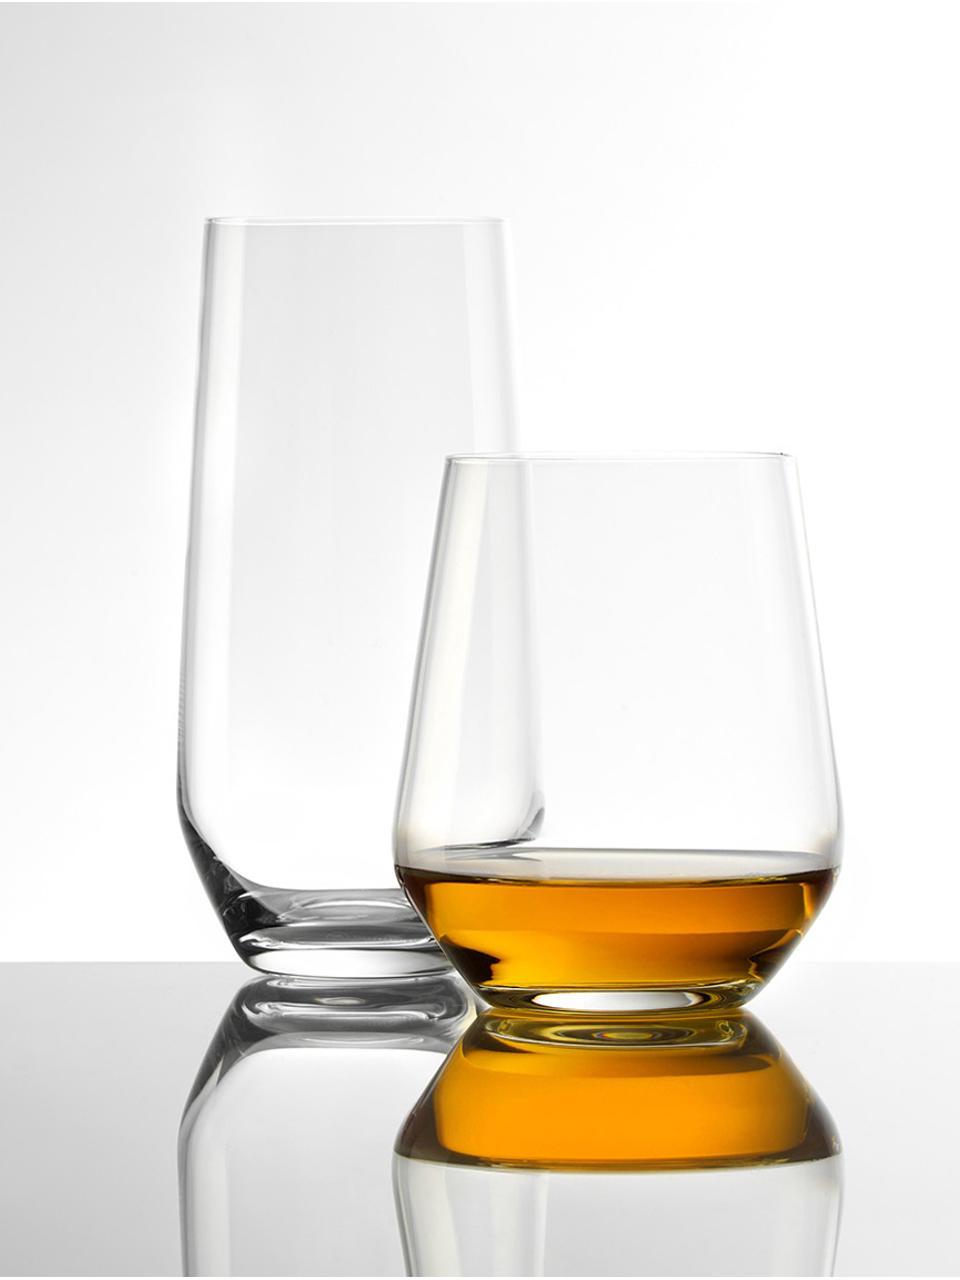 Bauchige Kristallgläser Revolution, 6 Stück, Kristallglas, Transparent, Ø 9 x H 11 cm